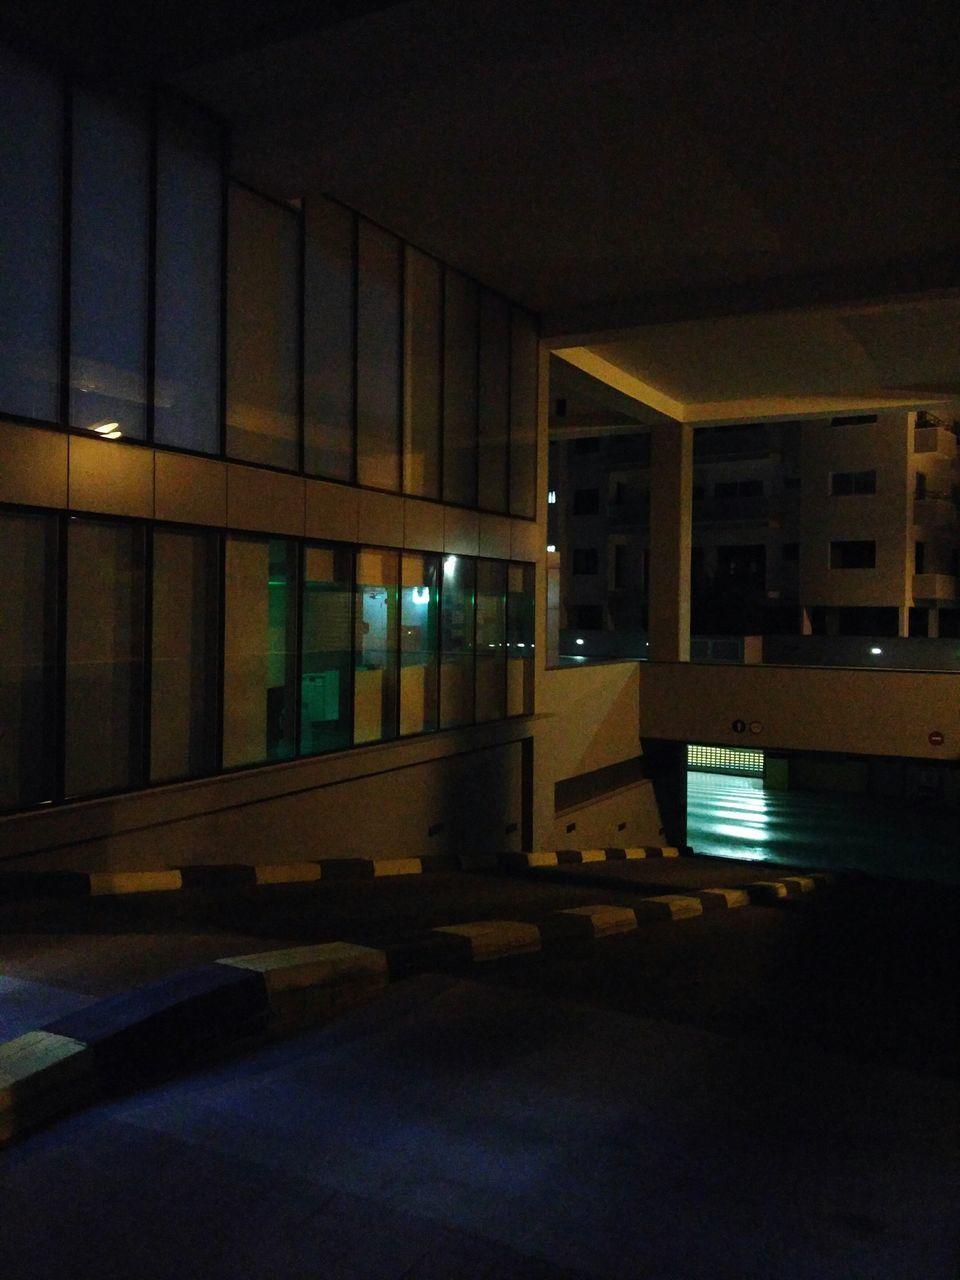 illuminated, architecture, built structure, indoors, night, no people, building exterior